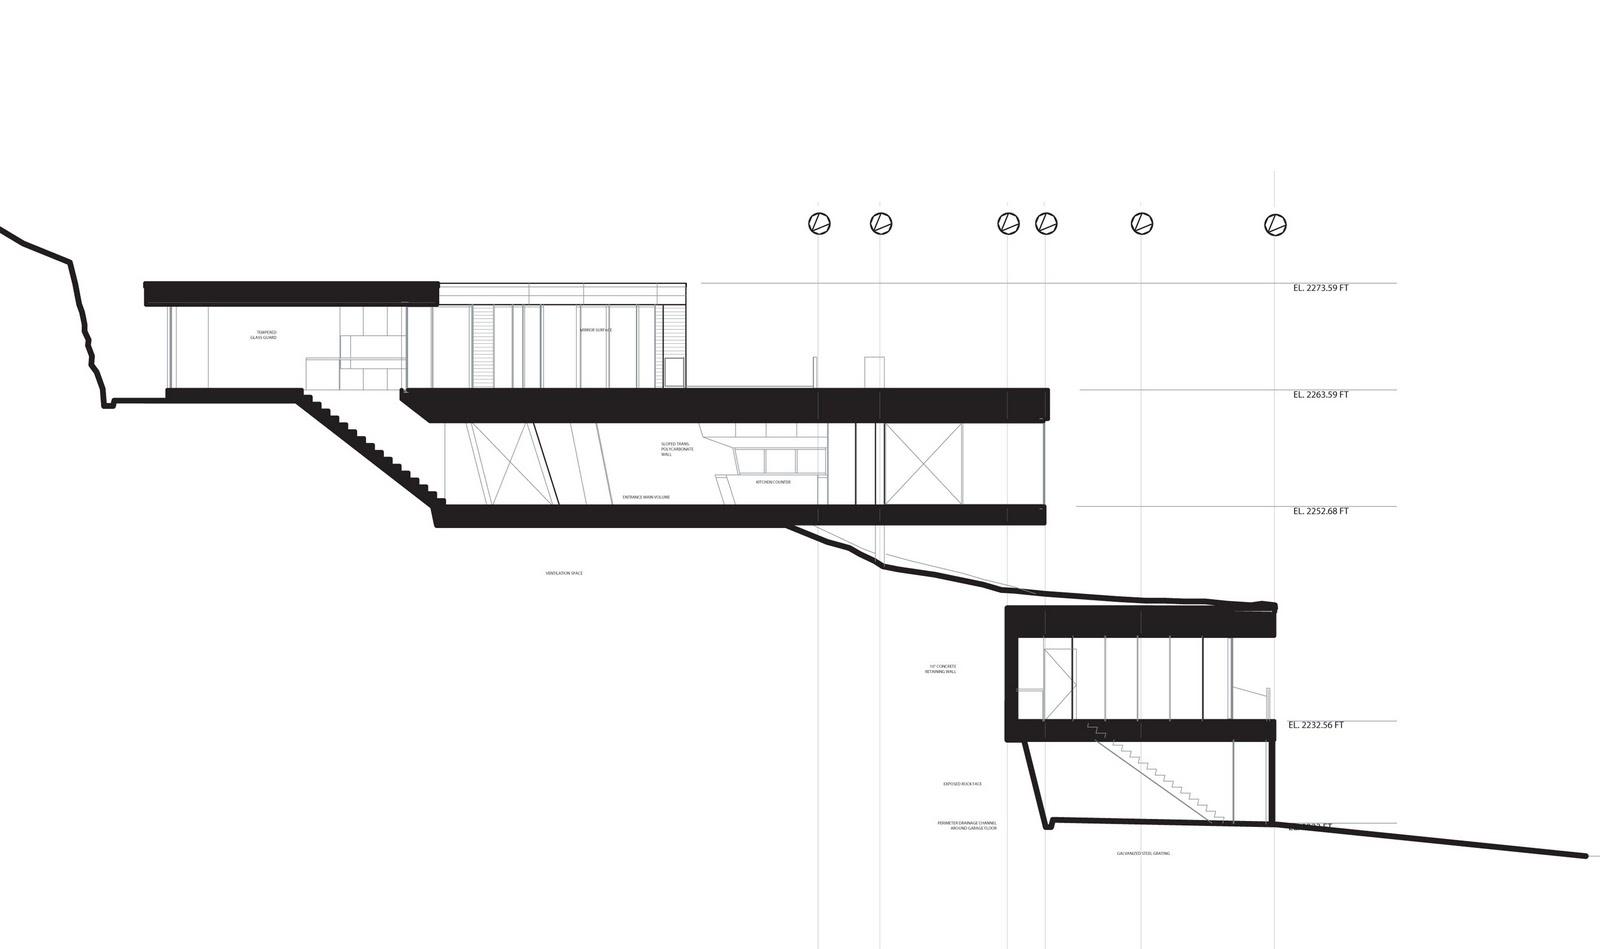 Mansion Floor Plans With Pool together with 540854236475956930 besides 5748bd3d3d62ea8d 5 Bedroom Mobile Home Floor Plans 6 Bedroom Double Wides besides 320881542170116647 together with New House Plans. on luxury house plans with pool